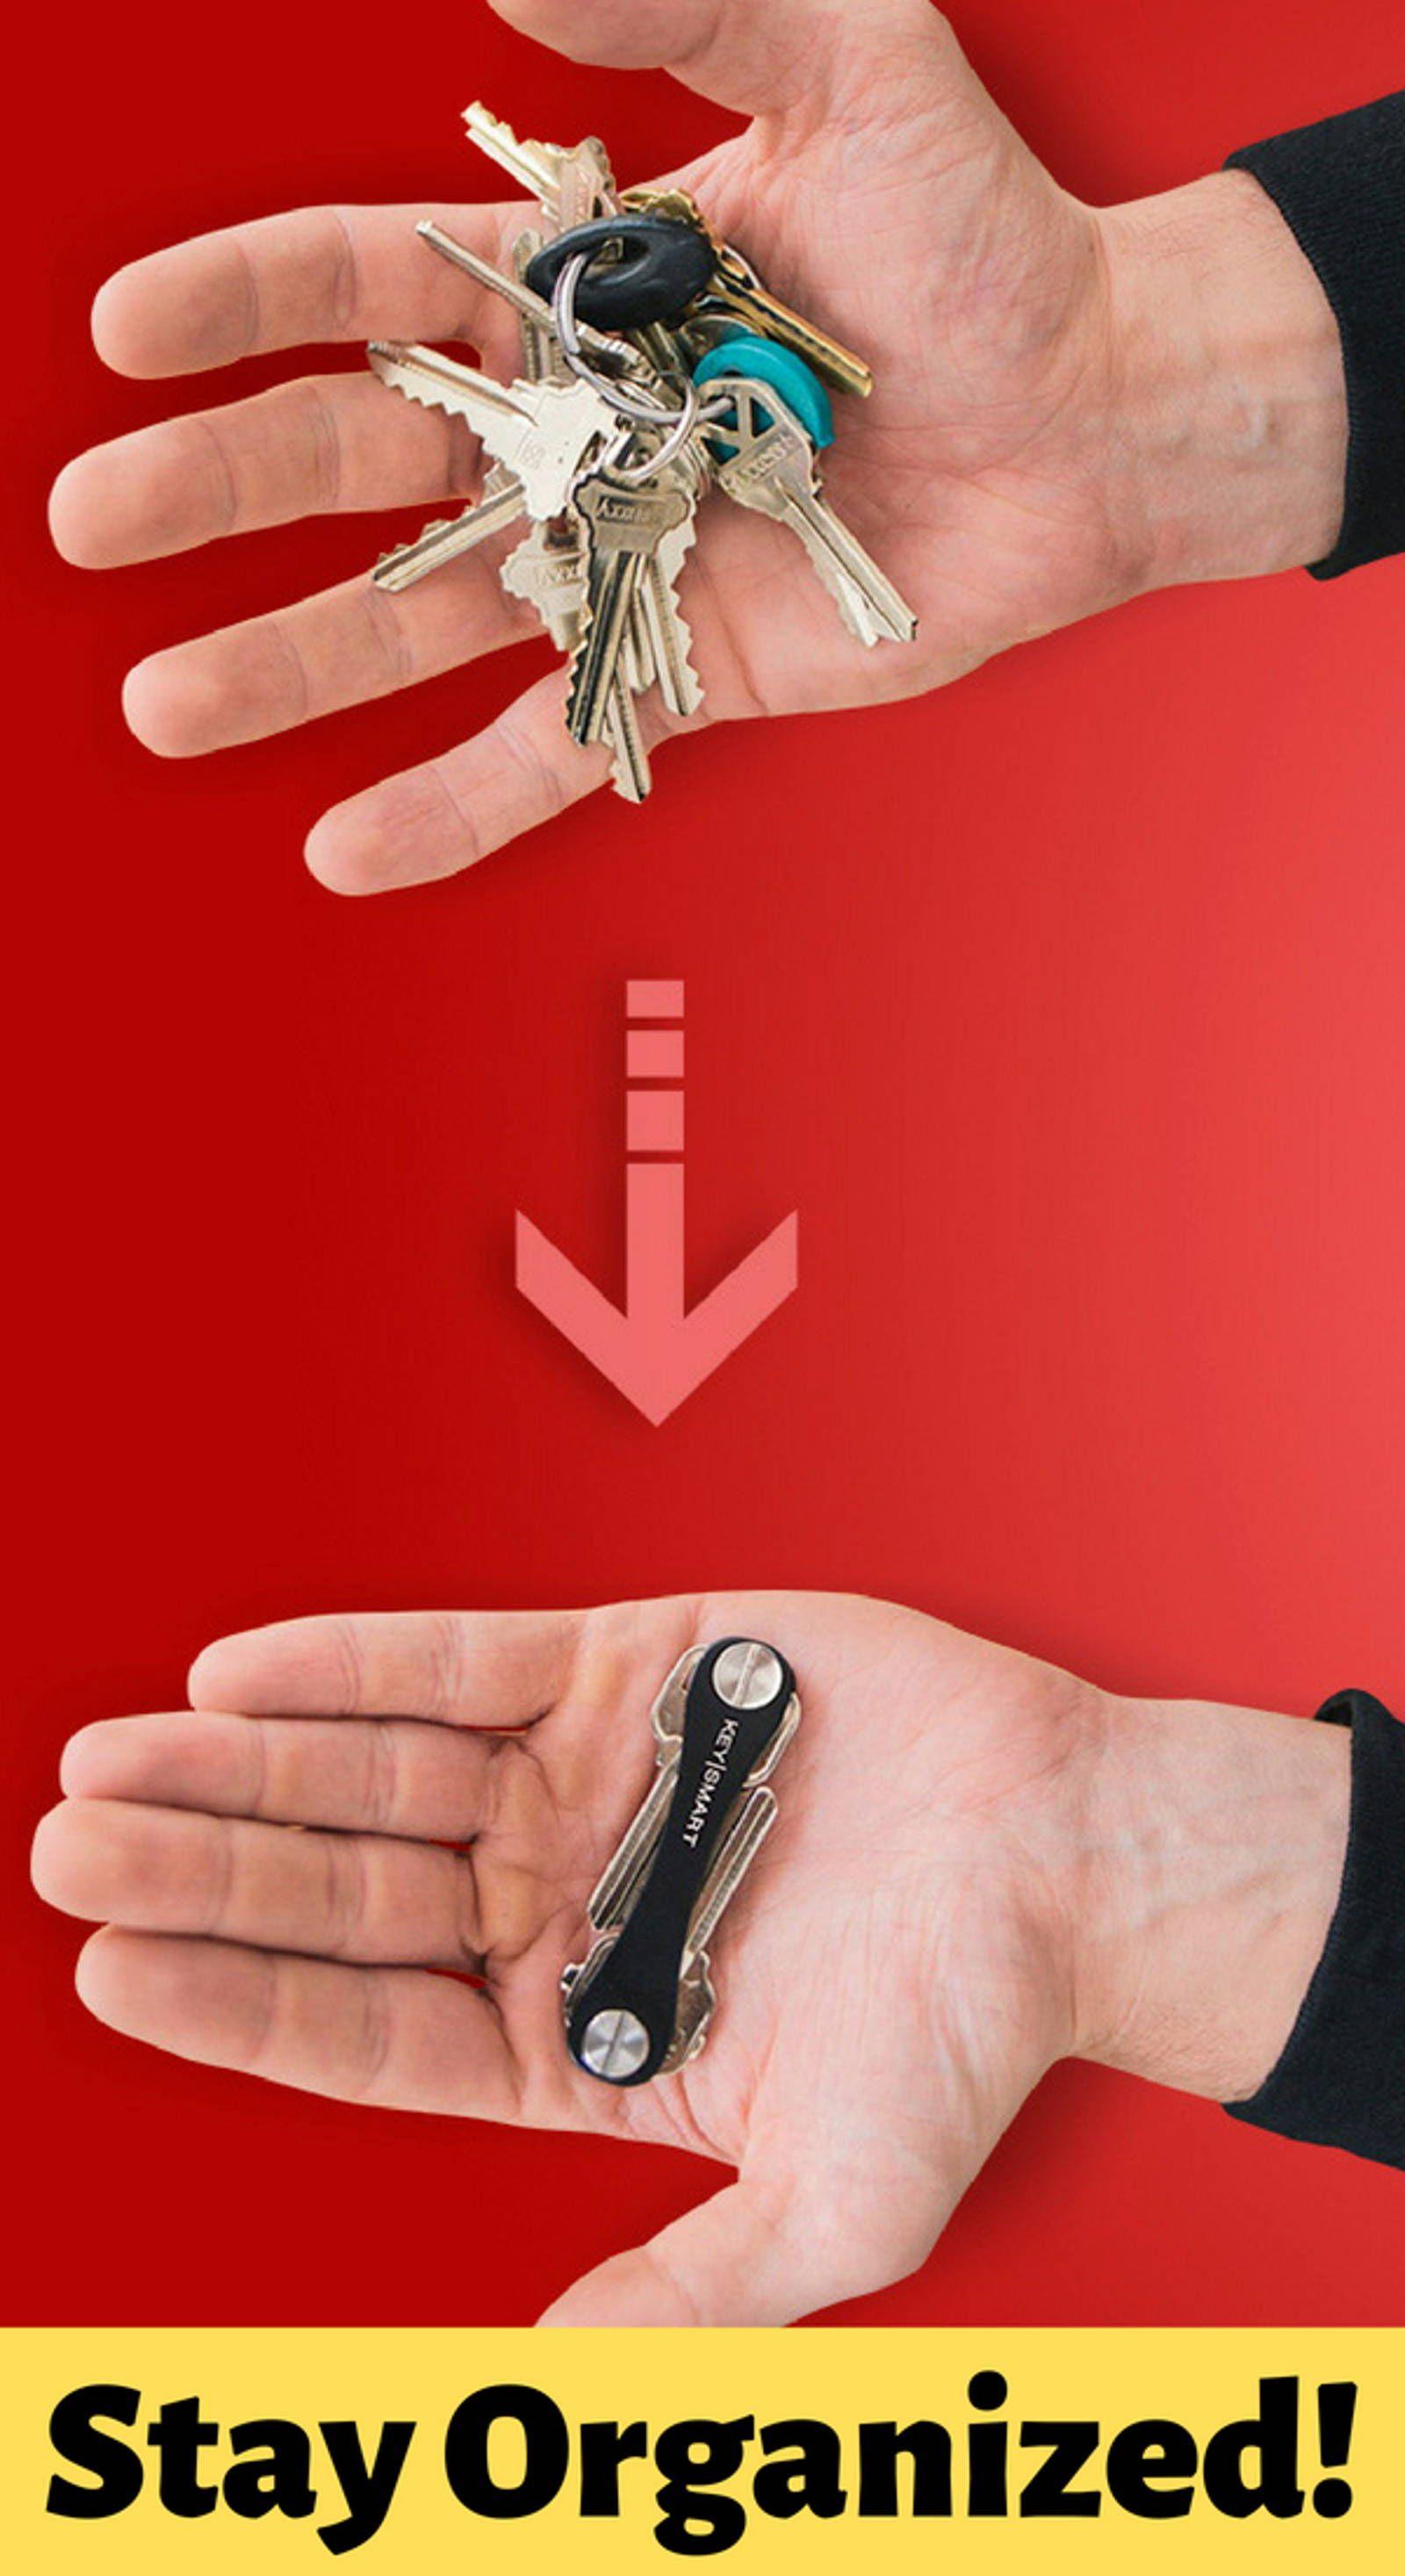 Keysmart The Original Key Chain Organizer Very